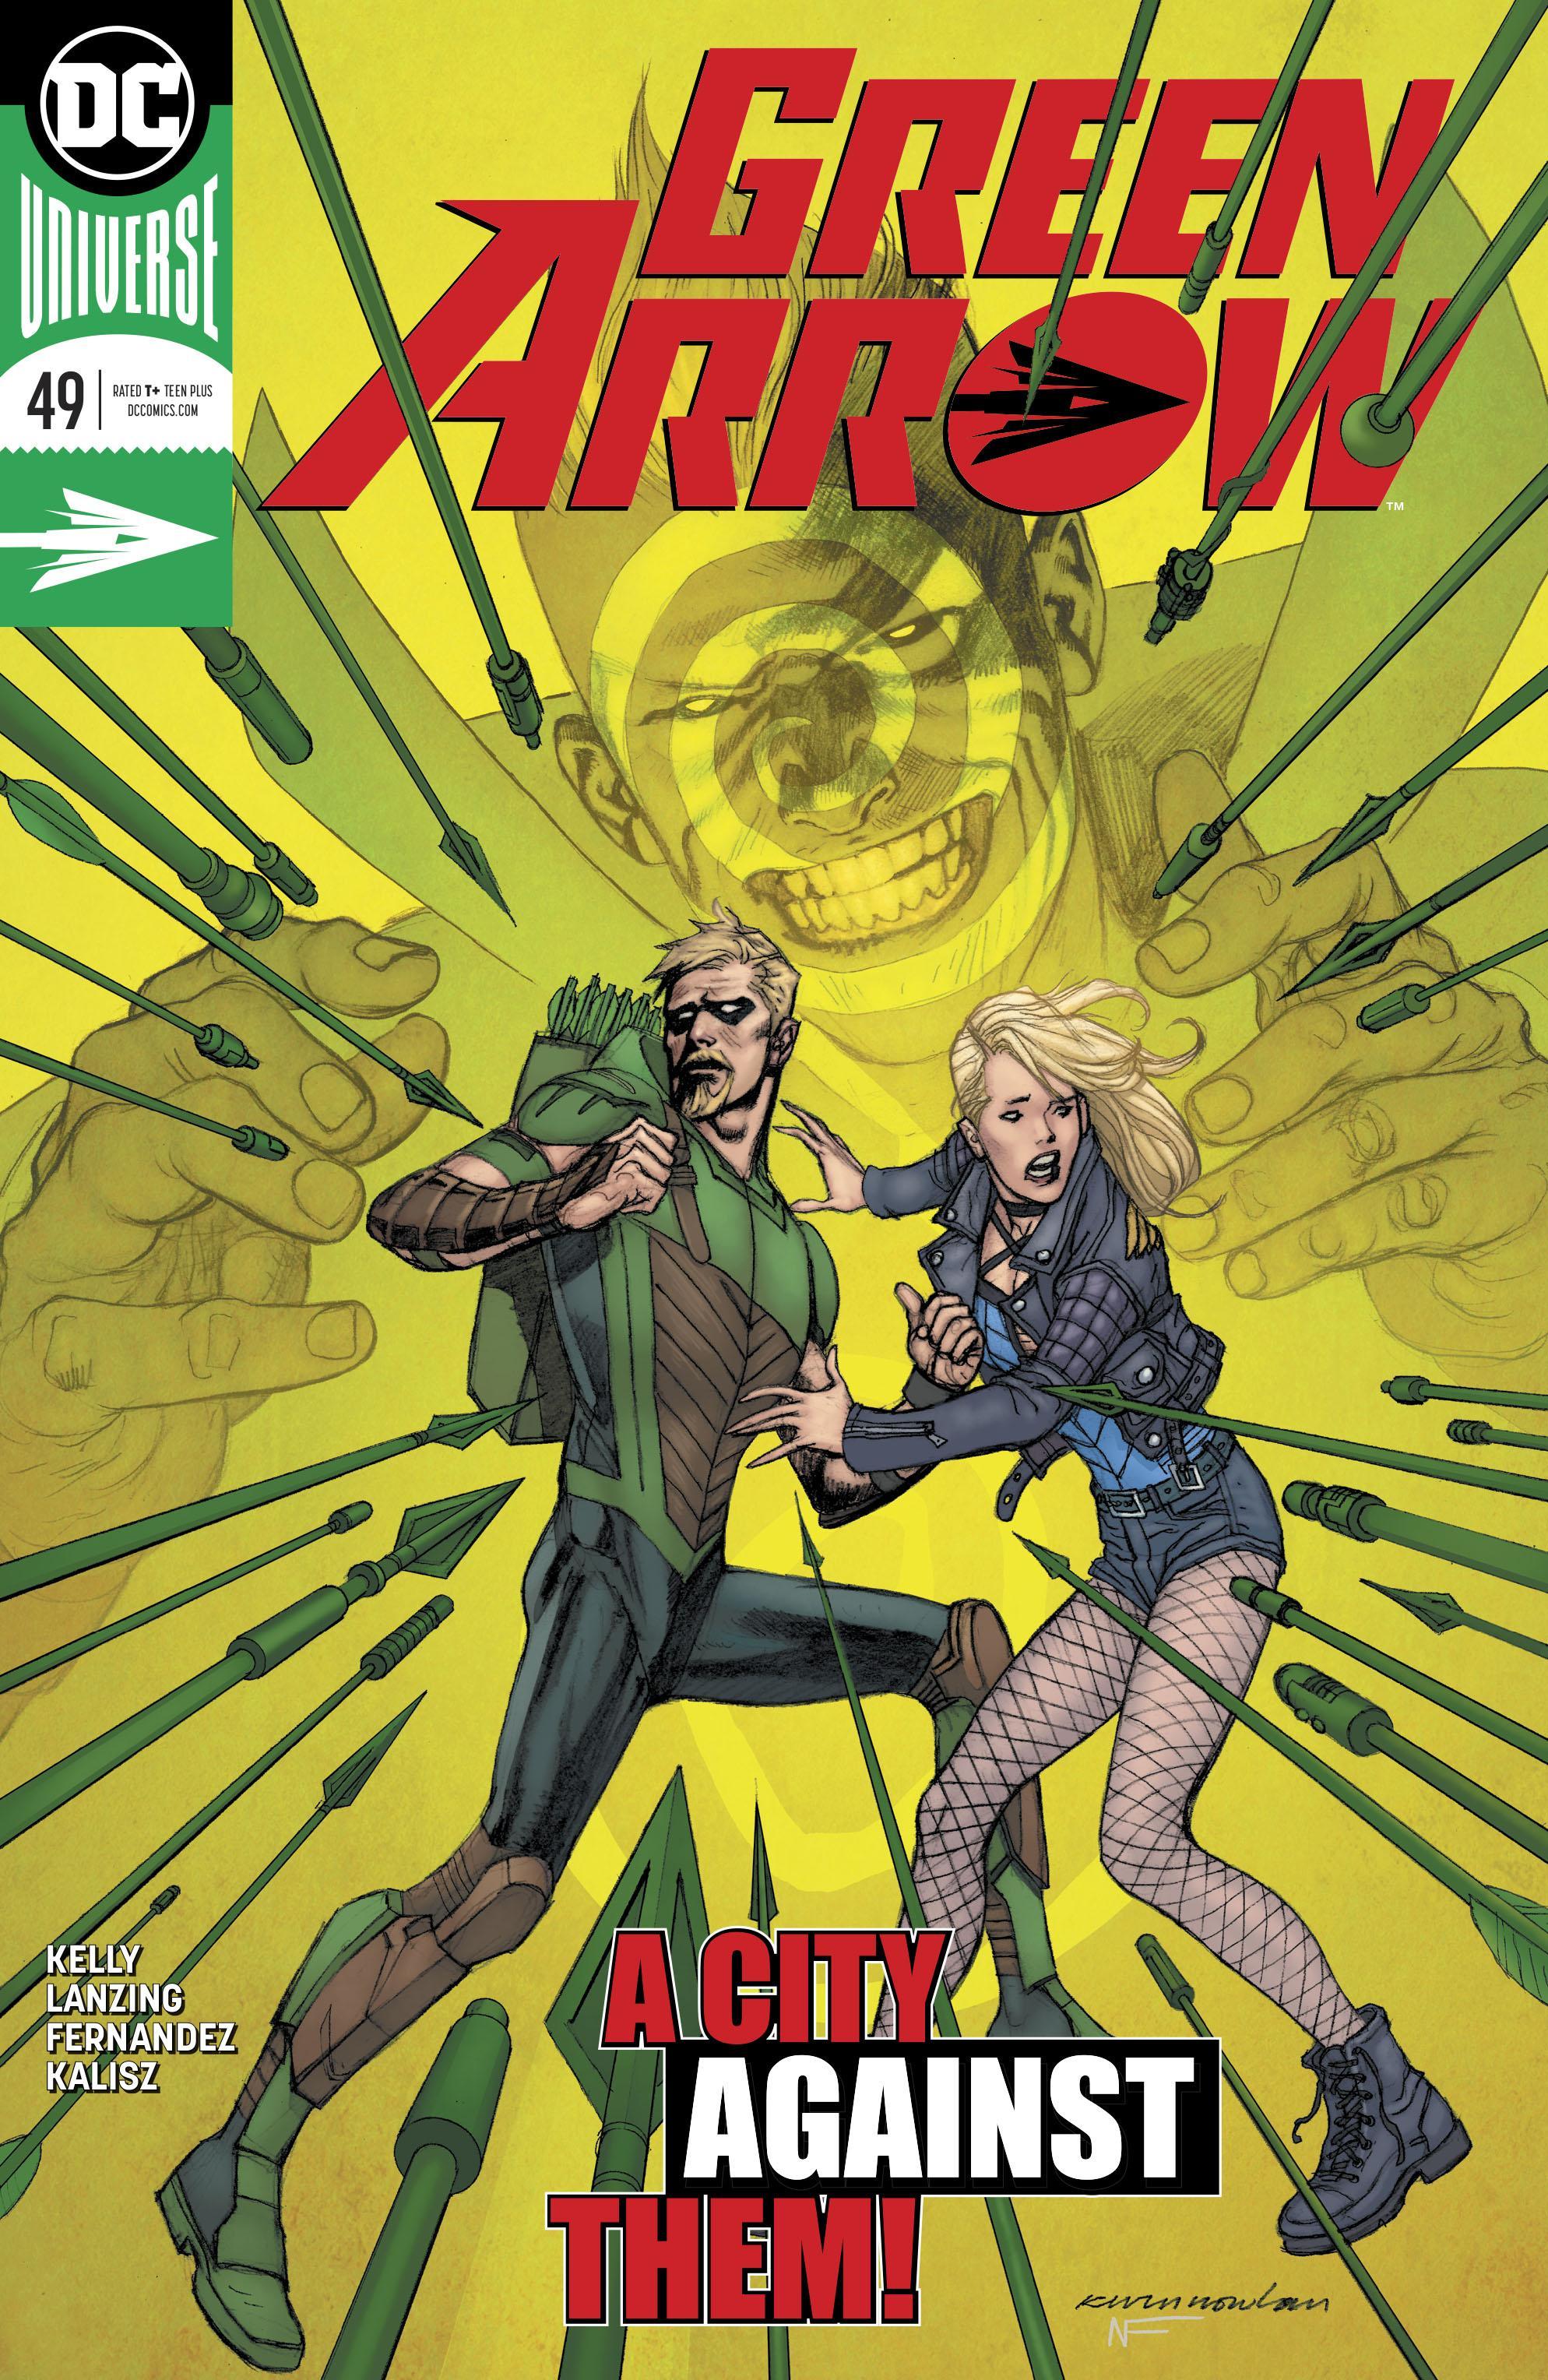 Green Arrow 049 2019 2 covers Digital Zone